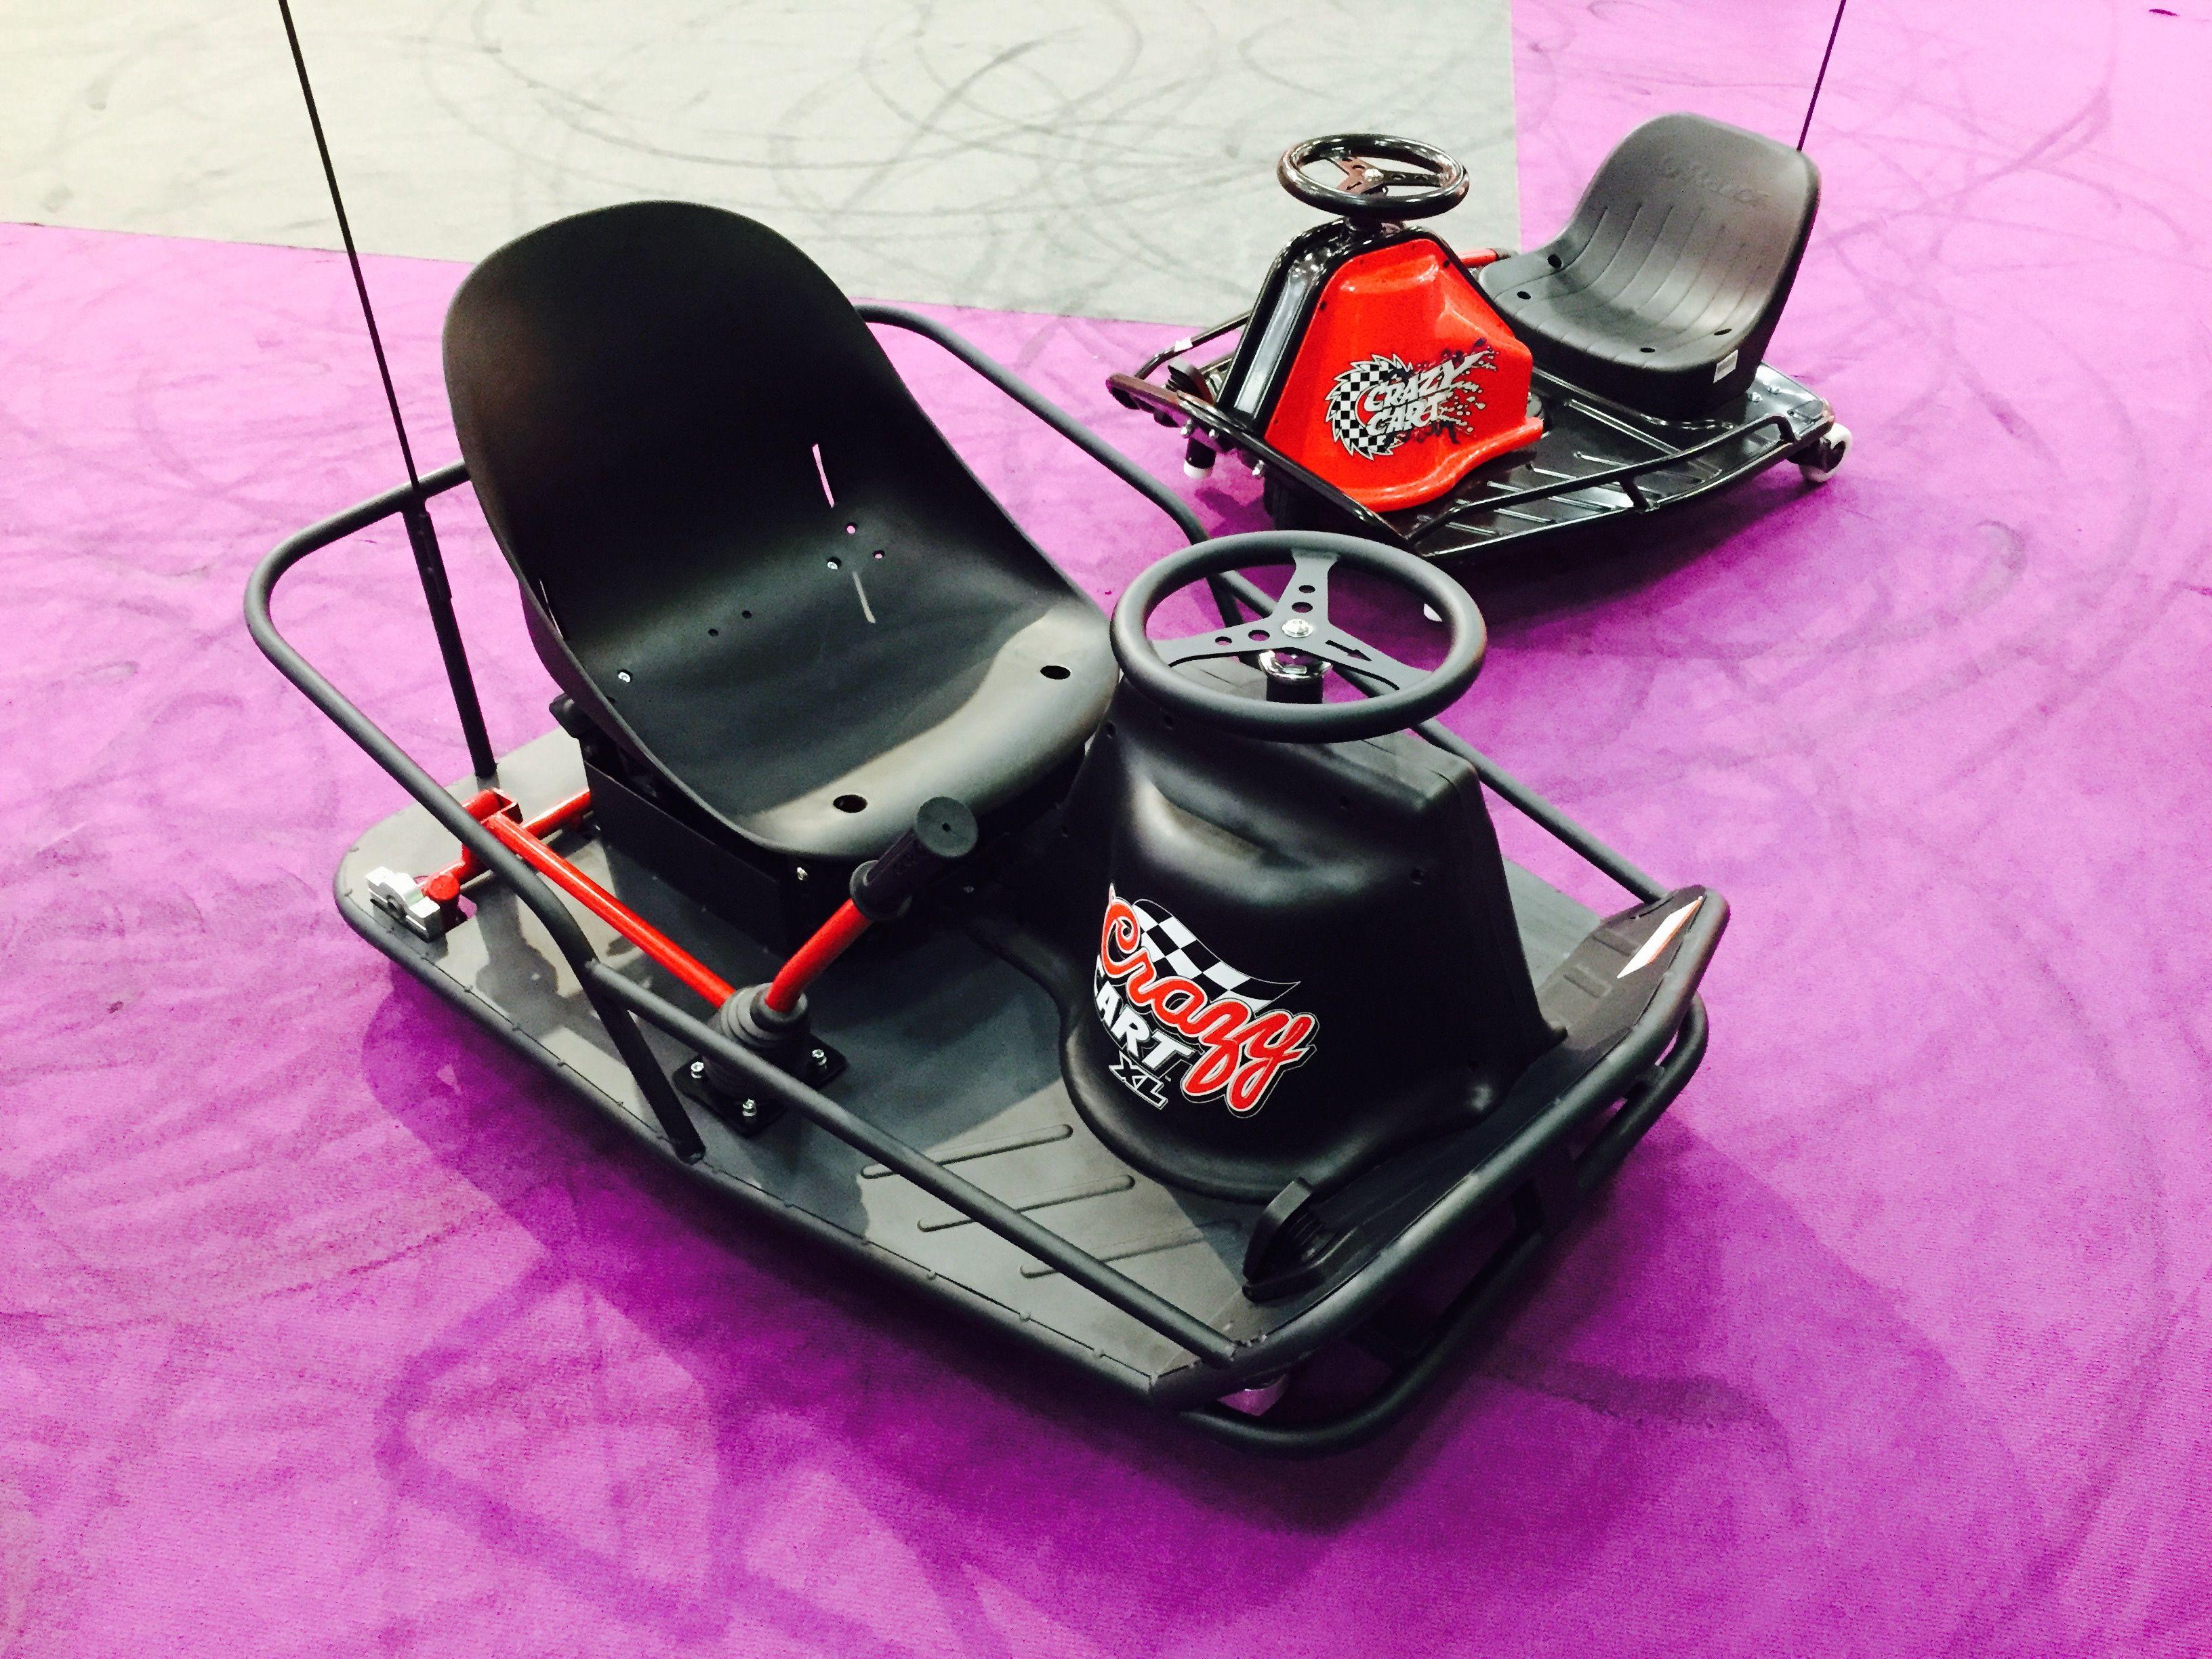 Razor Crazy Cart Xl Ultimate Drifting Machine For S Crazycart Karting